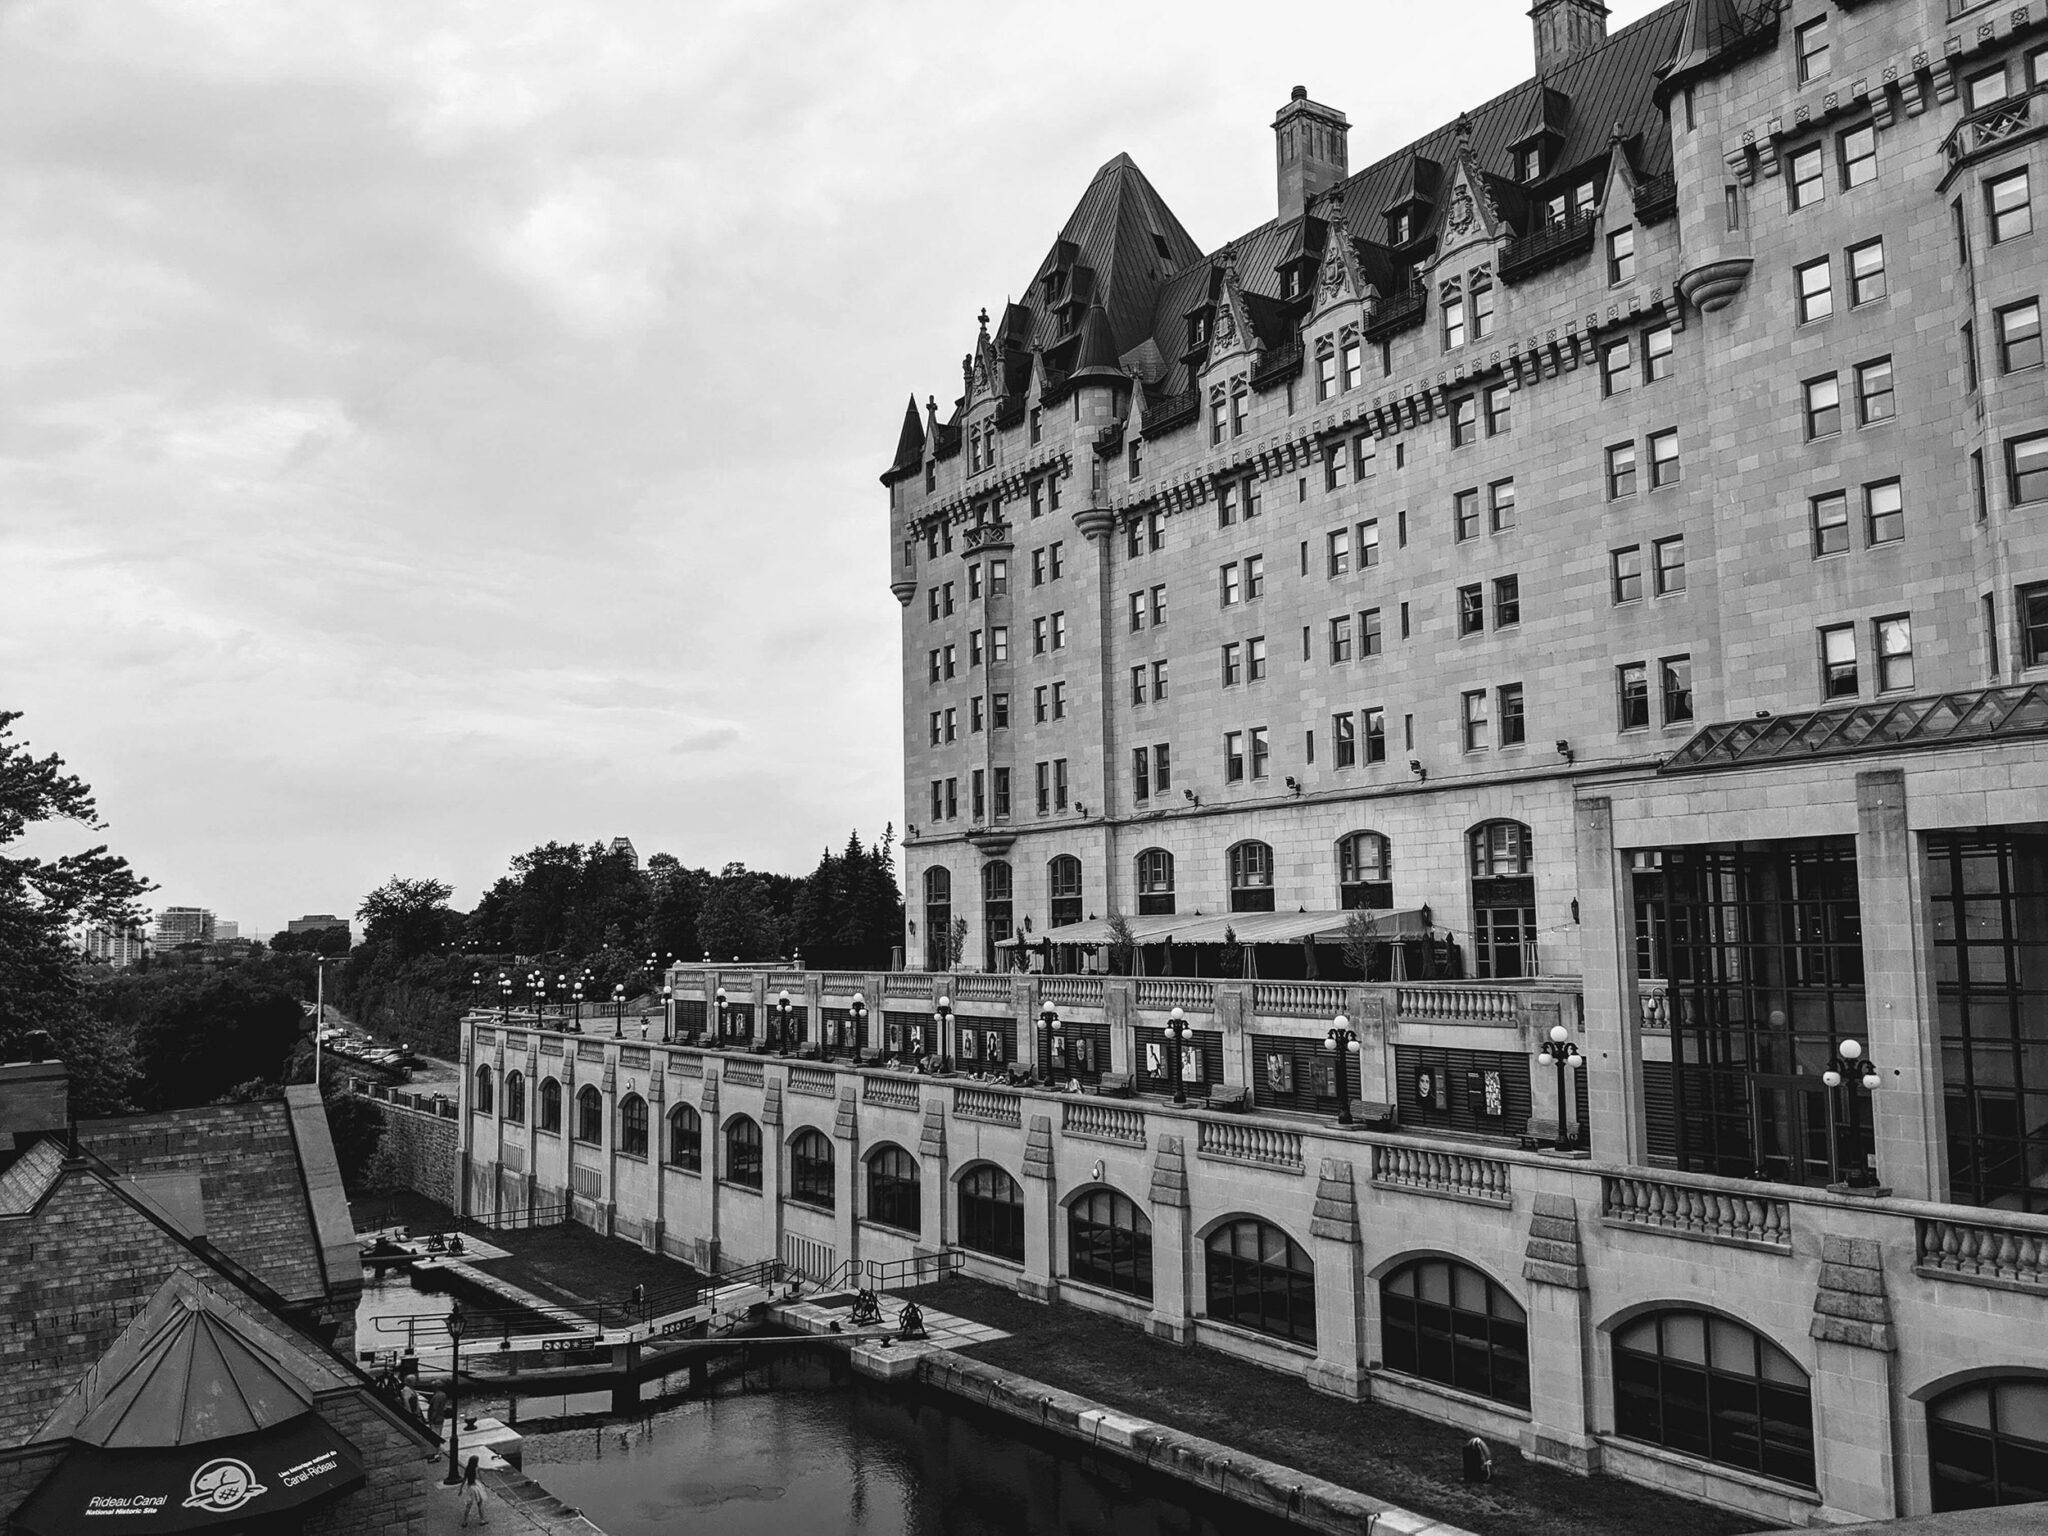 Chateau Laurier - Ottawa